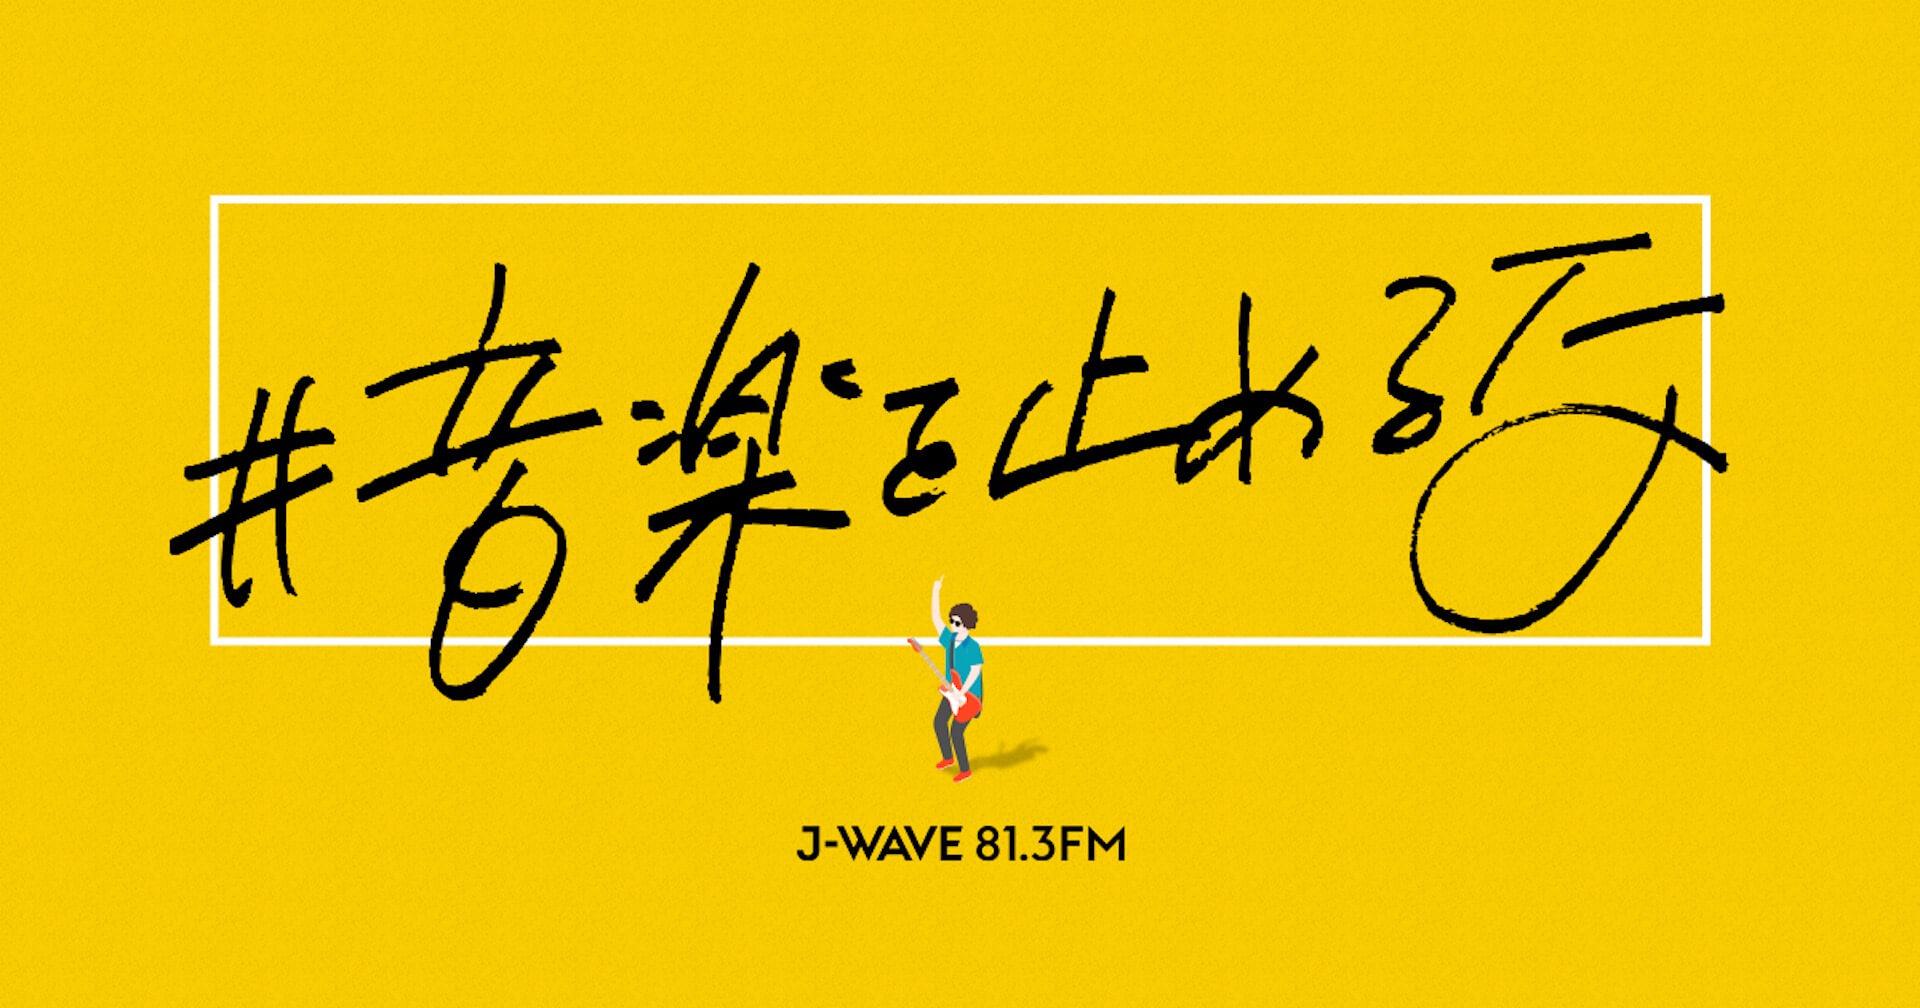 J-WAVE「#音楽を止めるな」プロジェクト無観客ライブにTENDRE、NakamuraEmi、THE CHARM PARKらが登場! music200417_ongakuwotomeruna_06